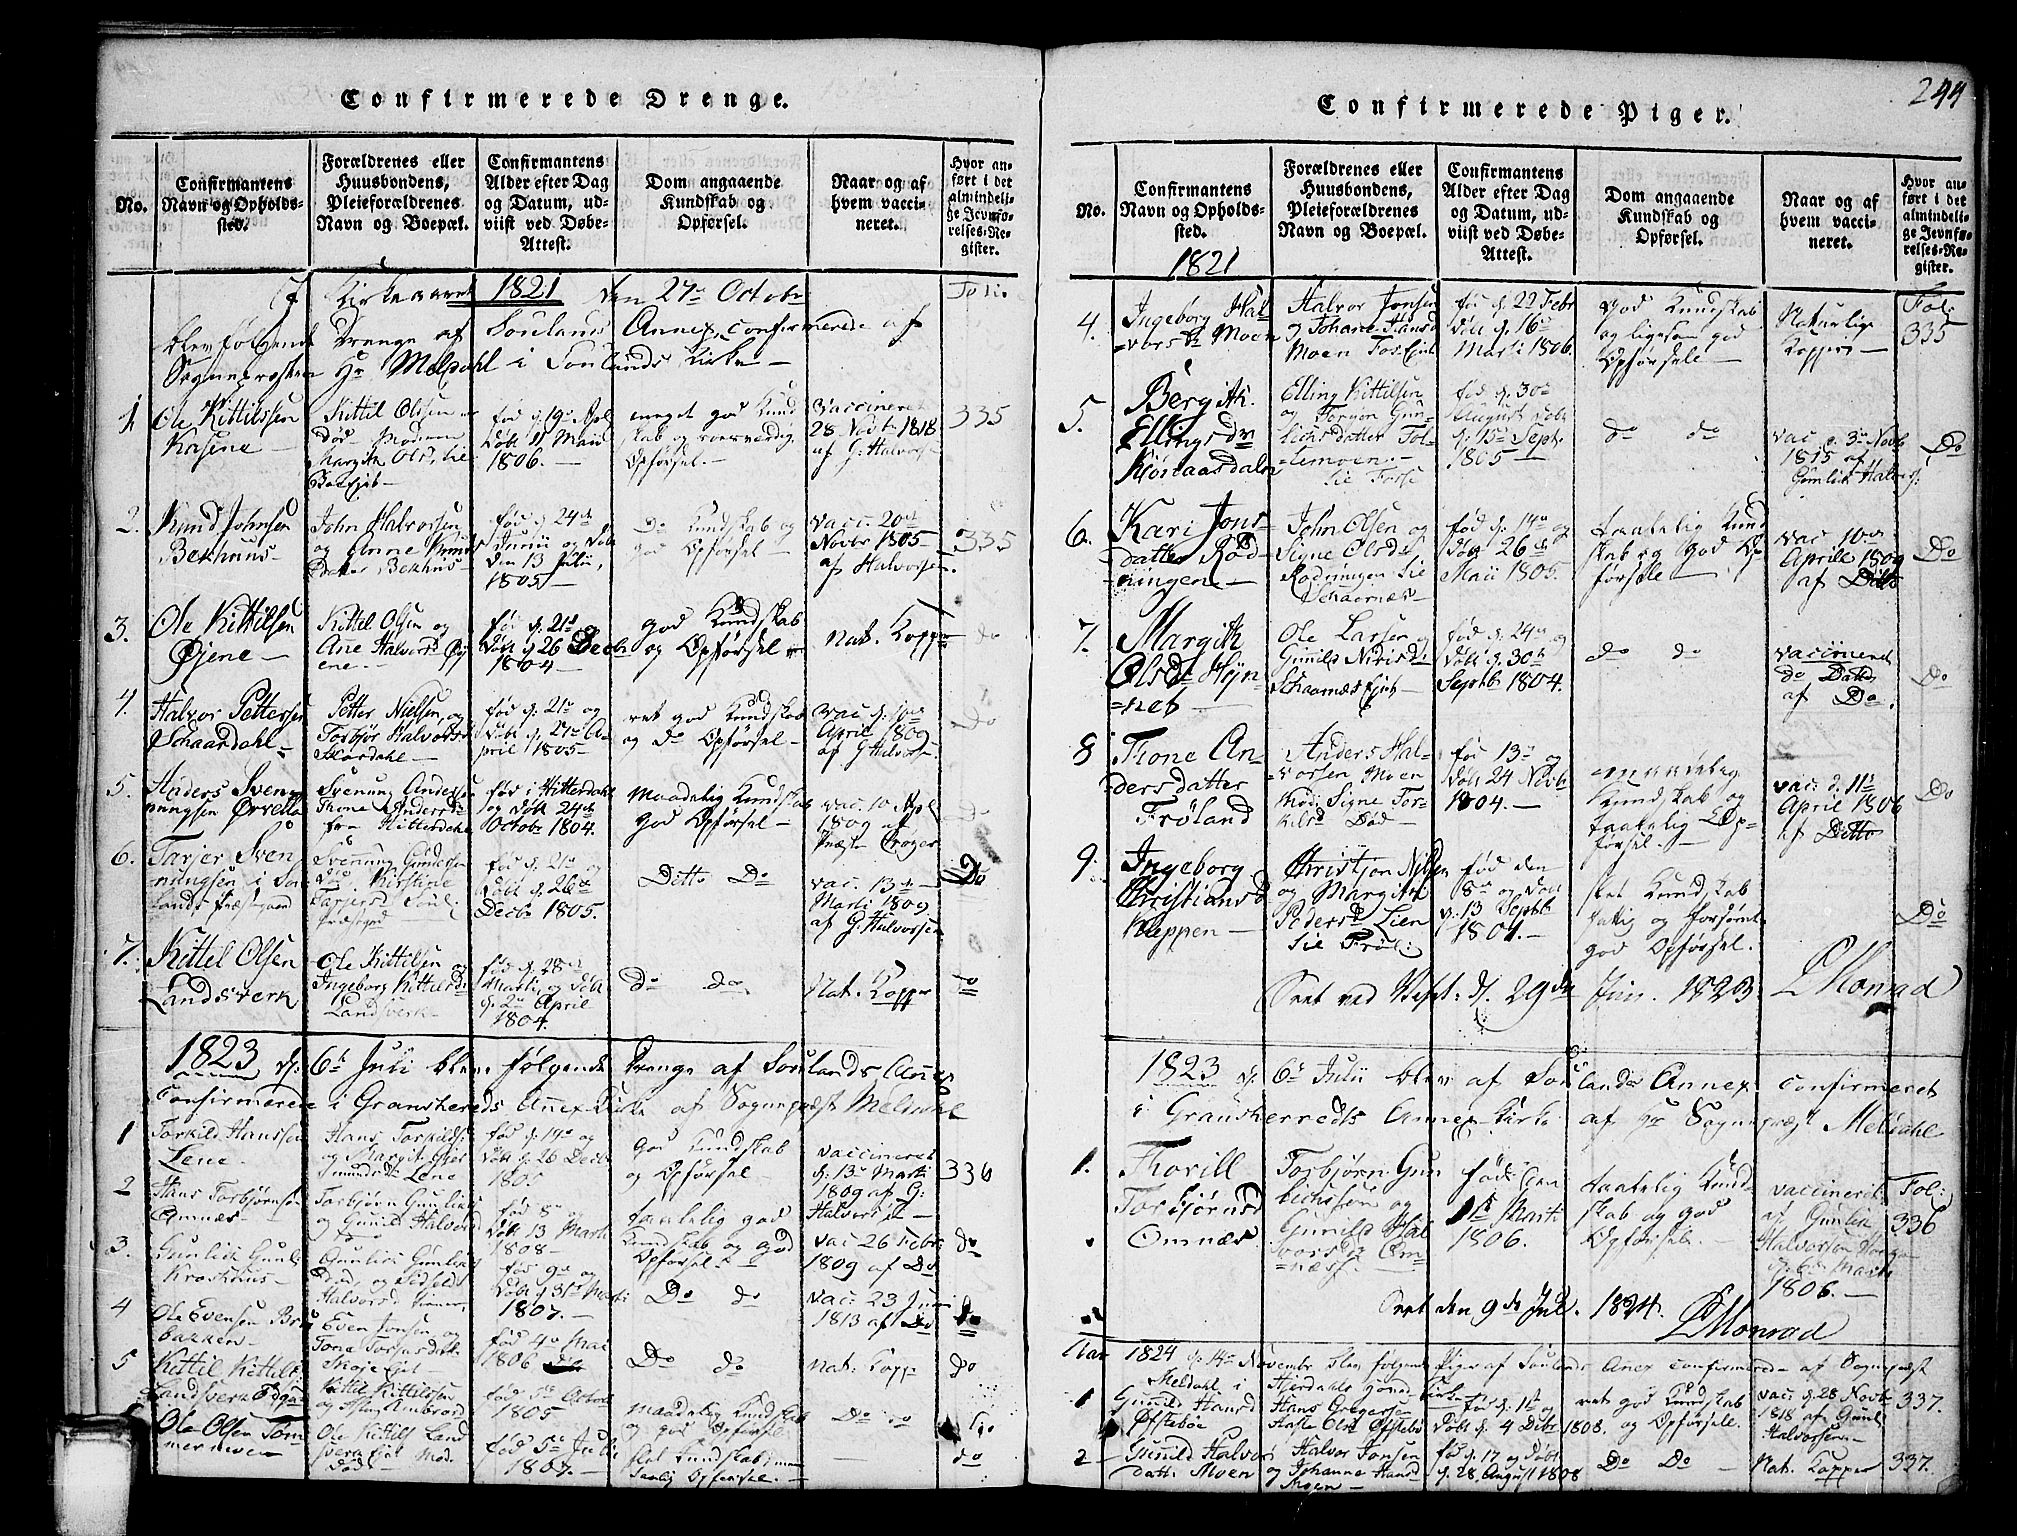 SAKO, Hjartdal kirkebøker, G/Gb/L0001: Klokkerbok nr. II 1, 1815-1842, s. 244